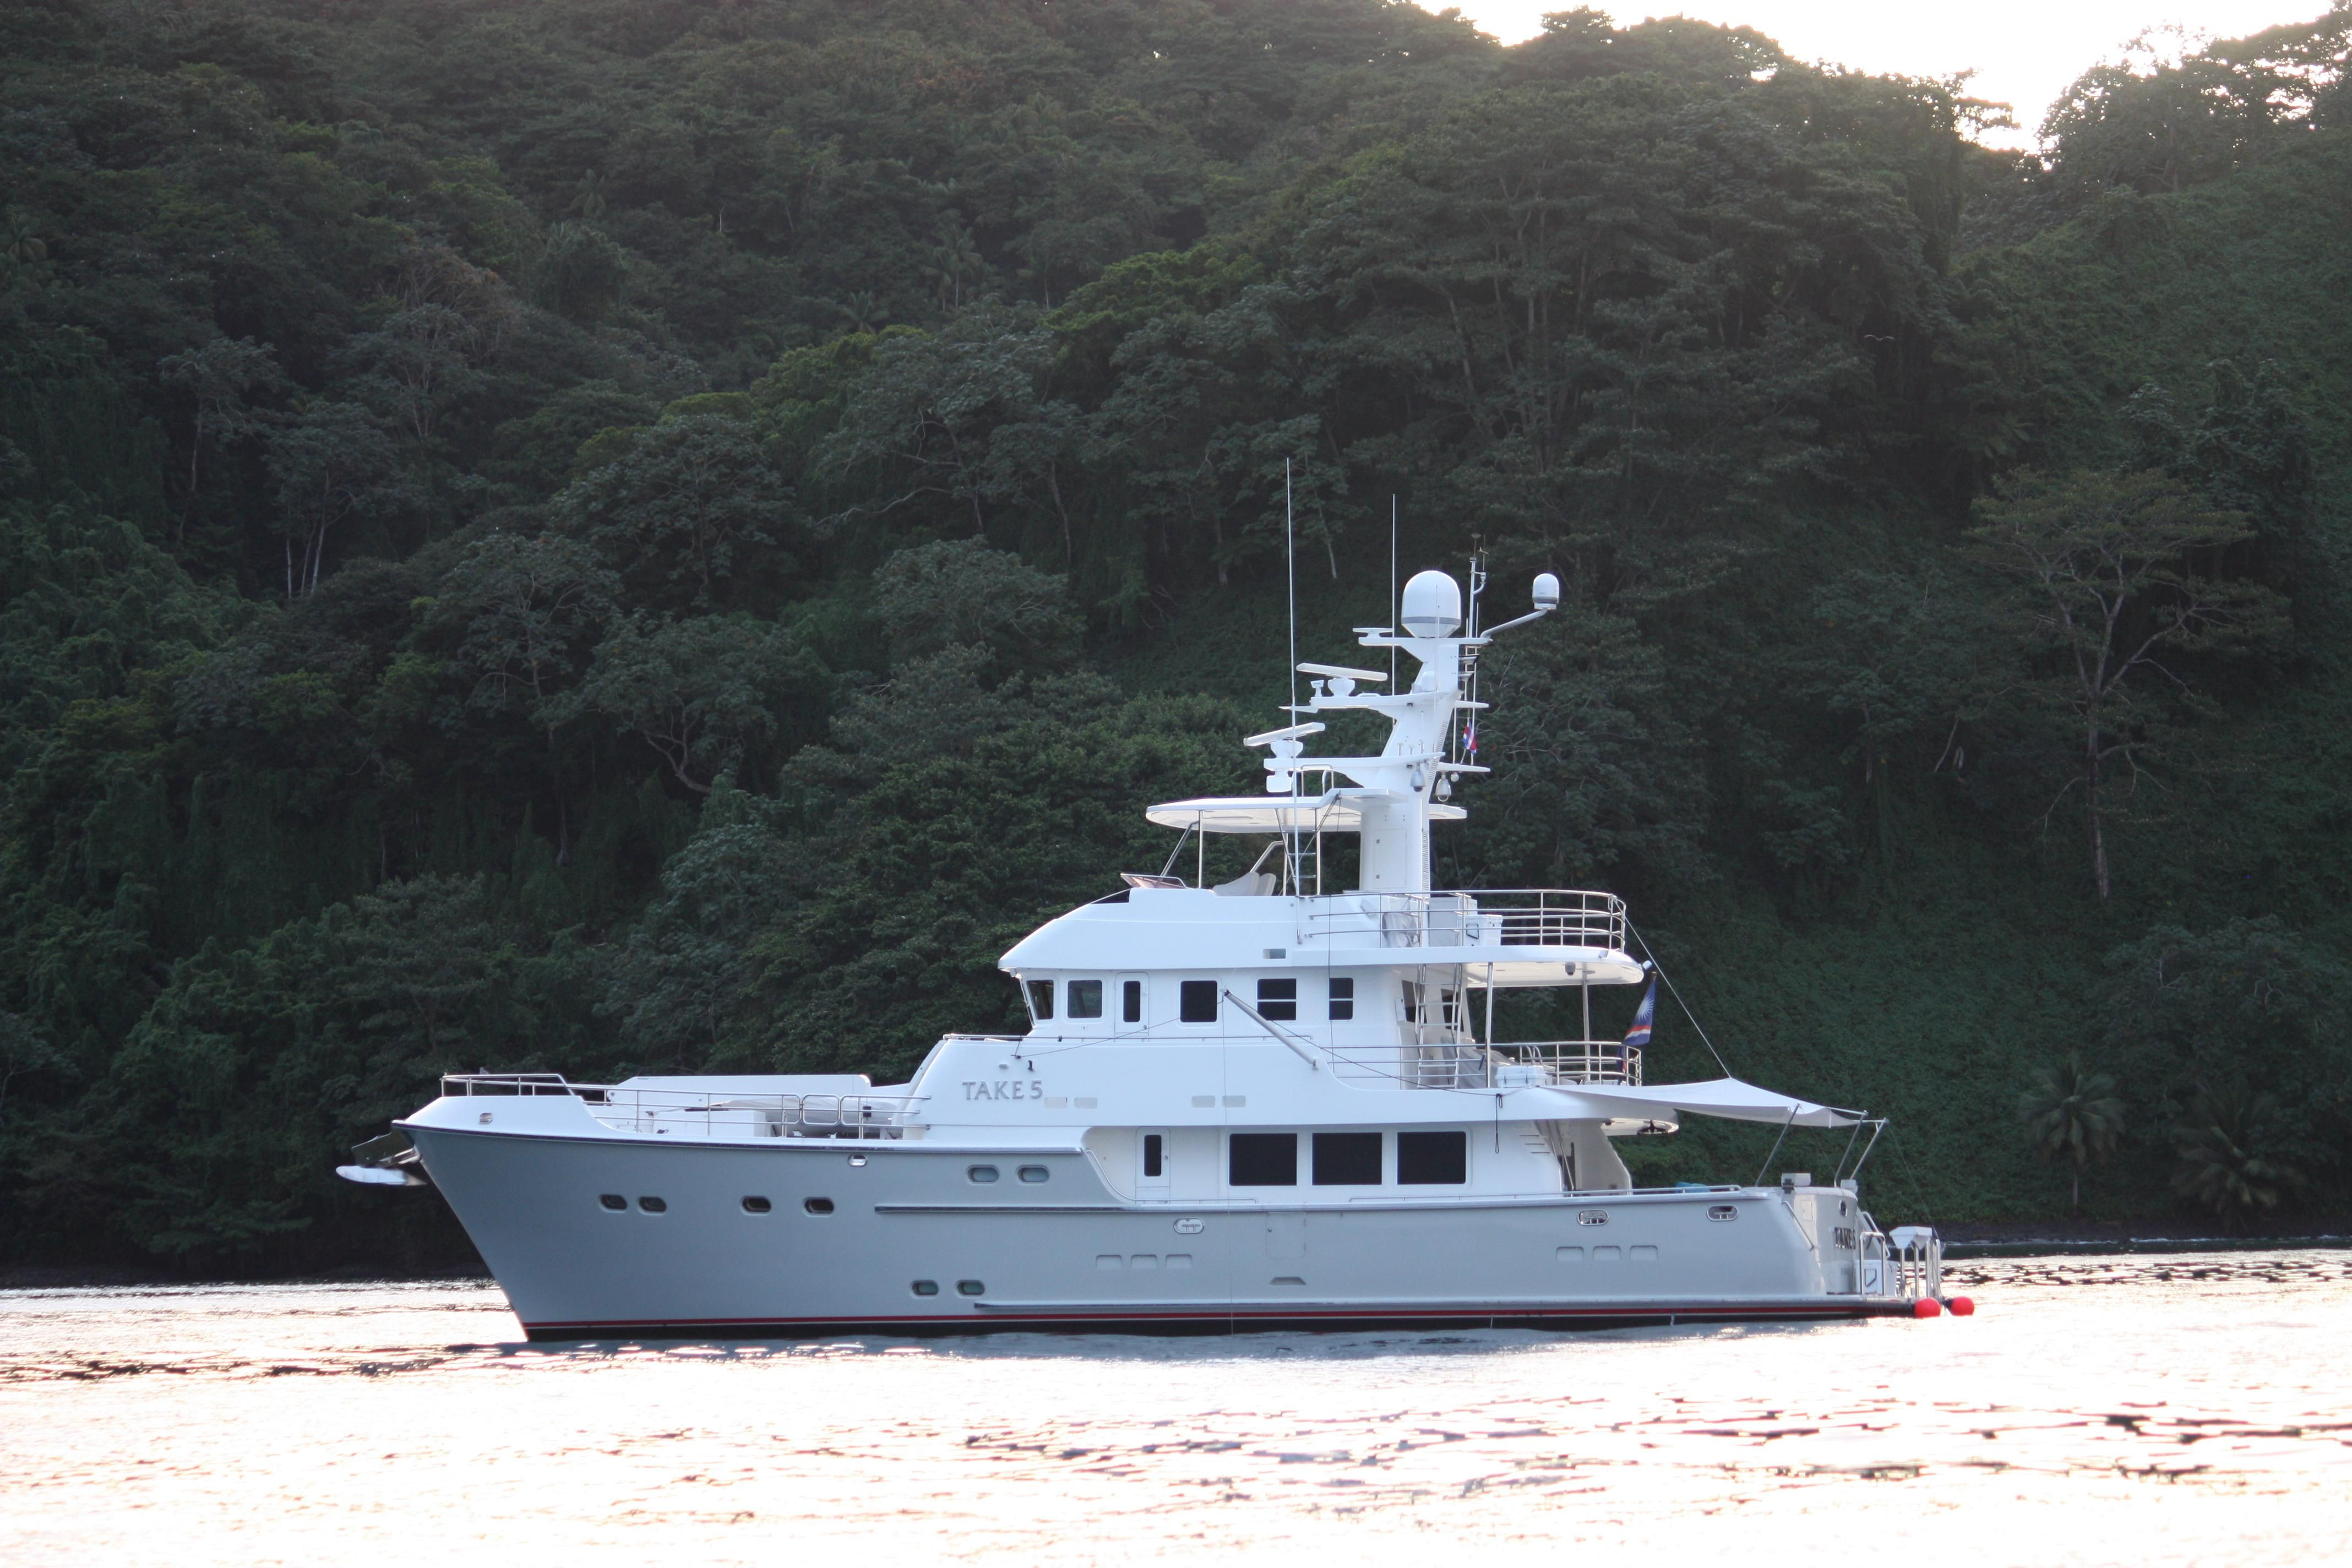 2009 Nordhavn 76 Power Boat For Sale - www.yachtworld.com